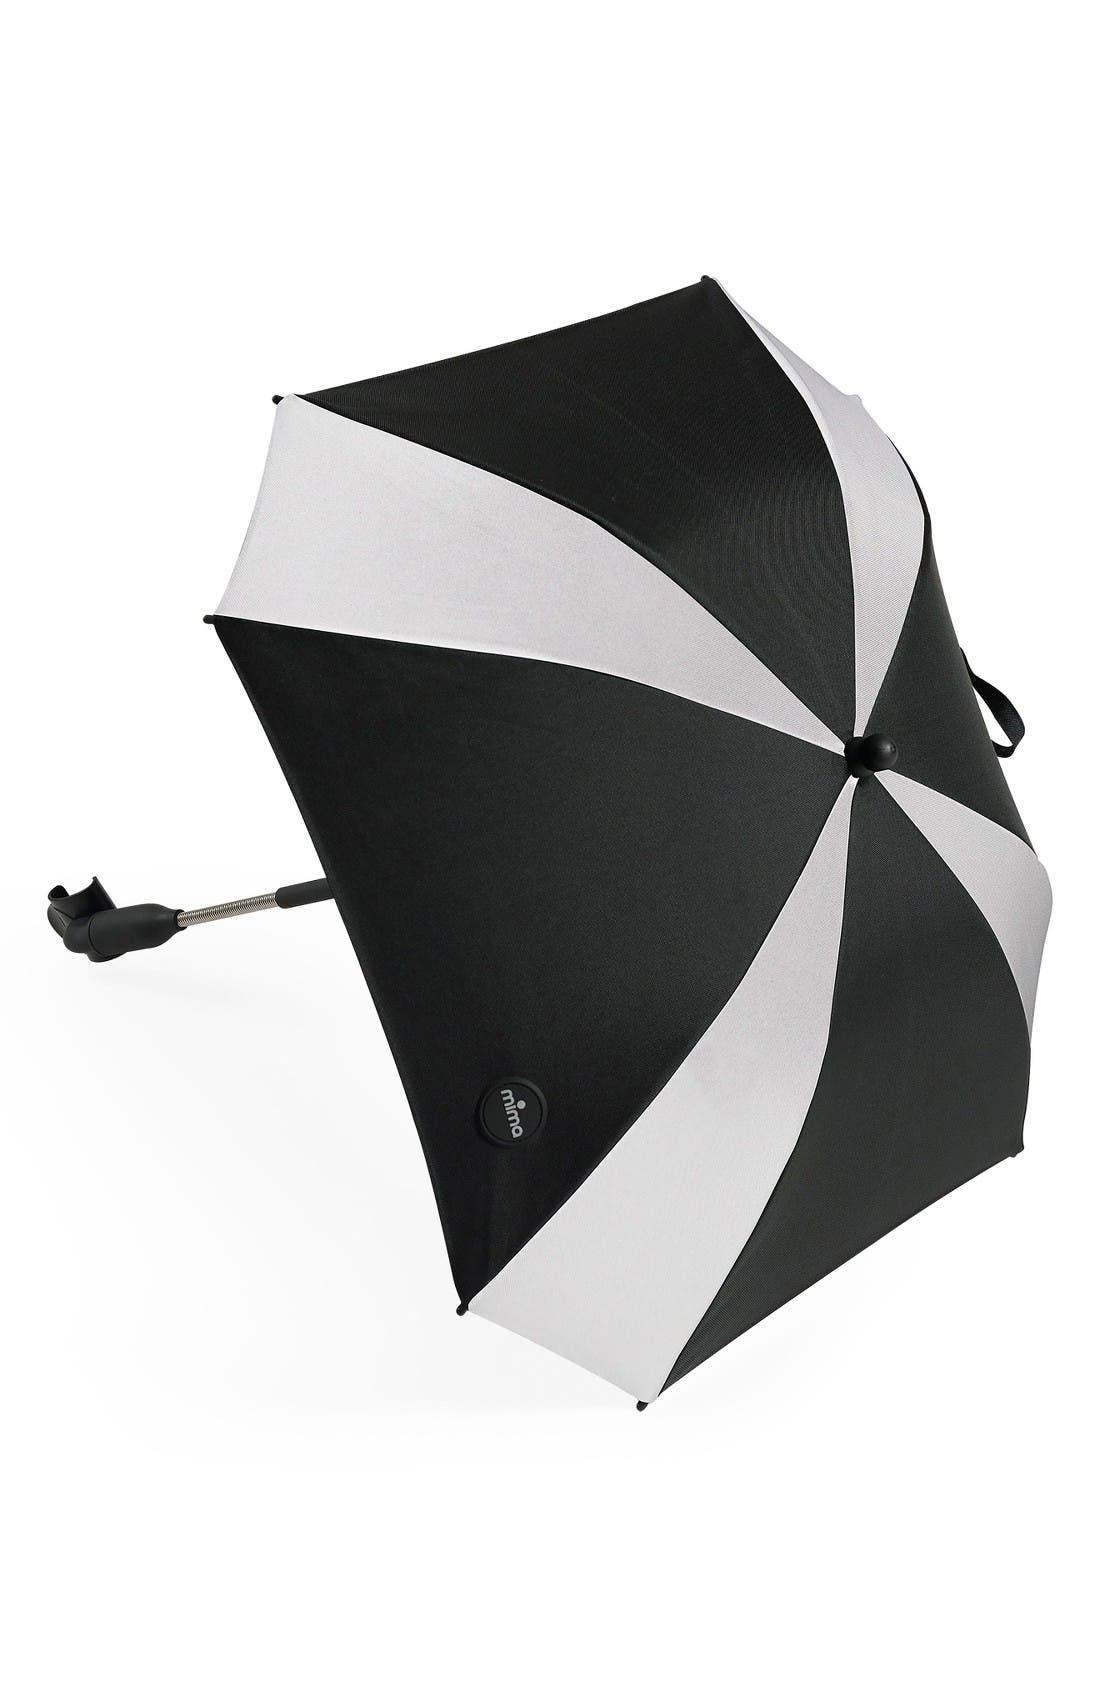 Main Image - Mima Stroller Umbrella